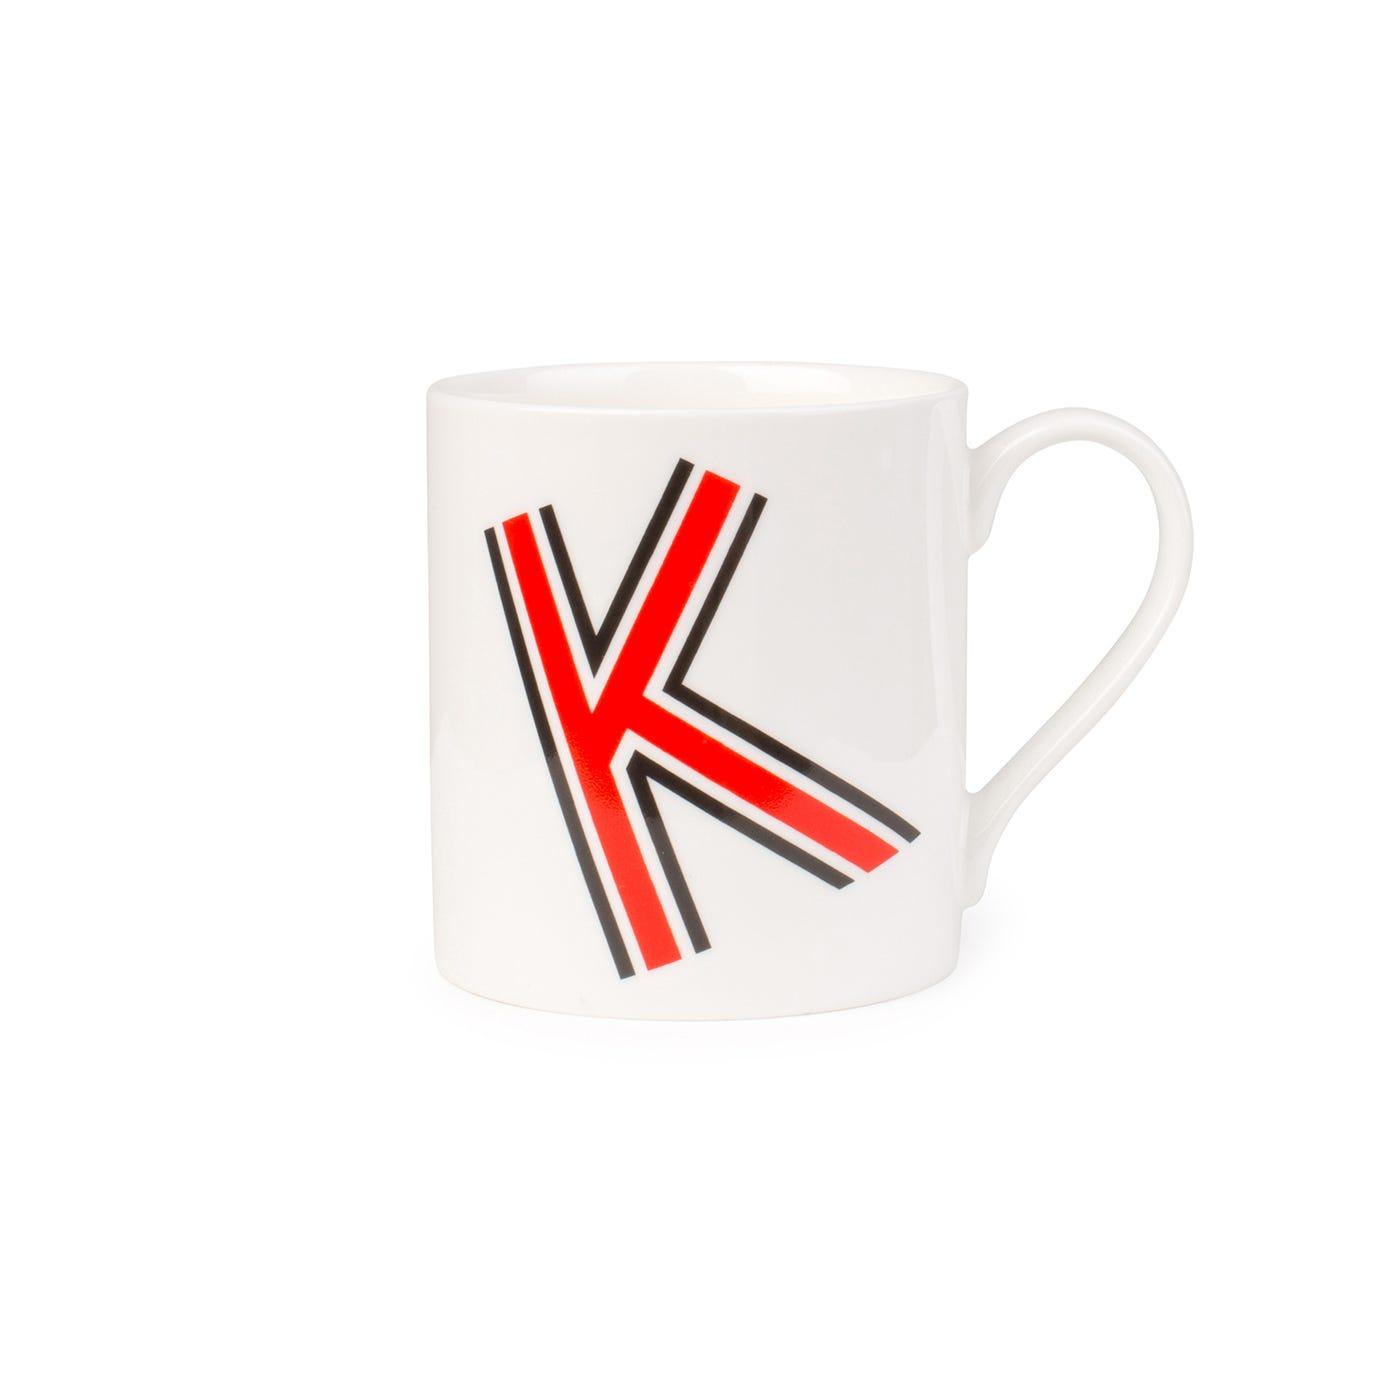 Heal's Heritage Alphabet Mug K